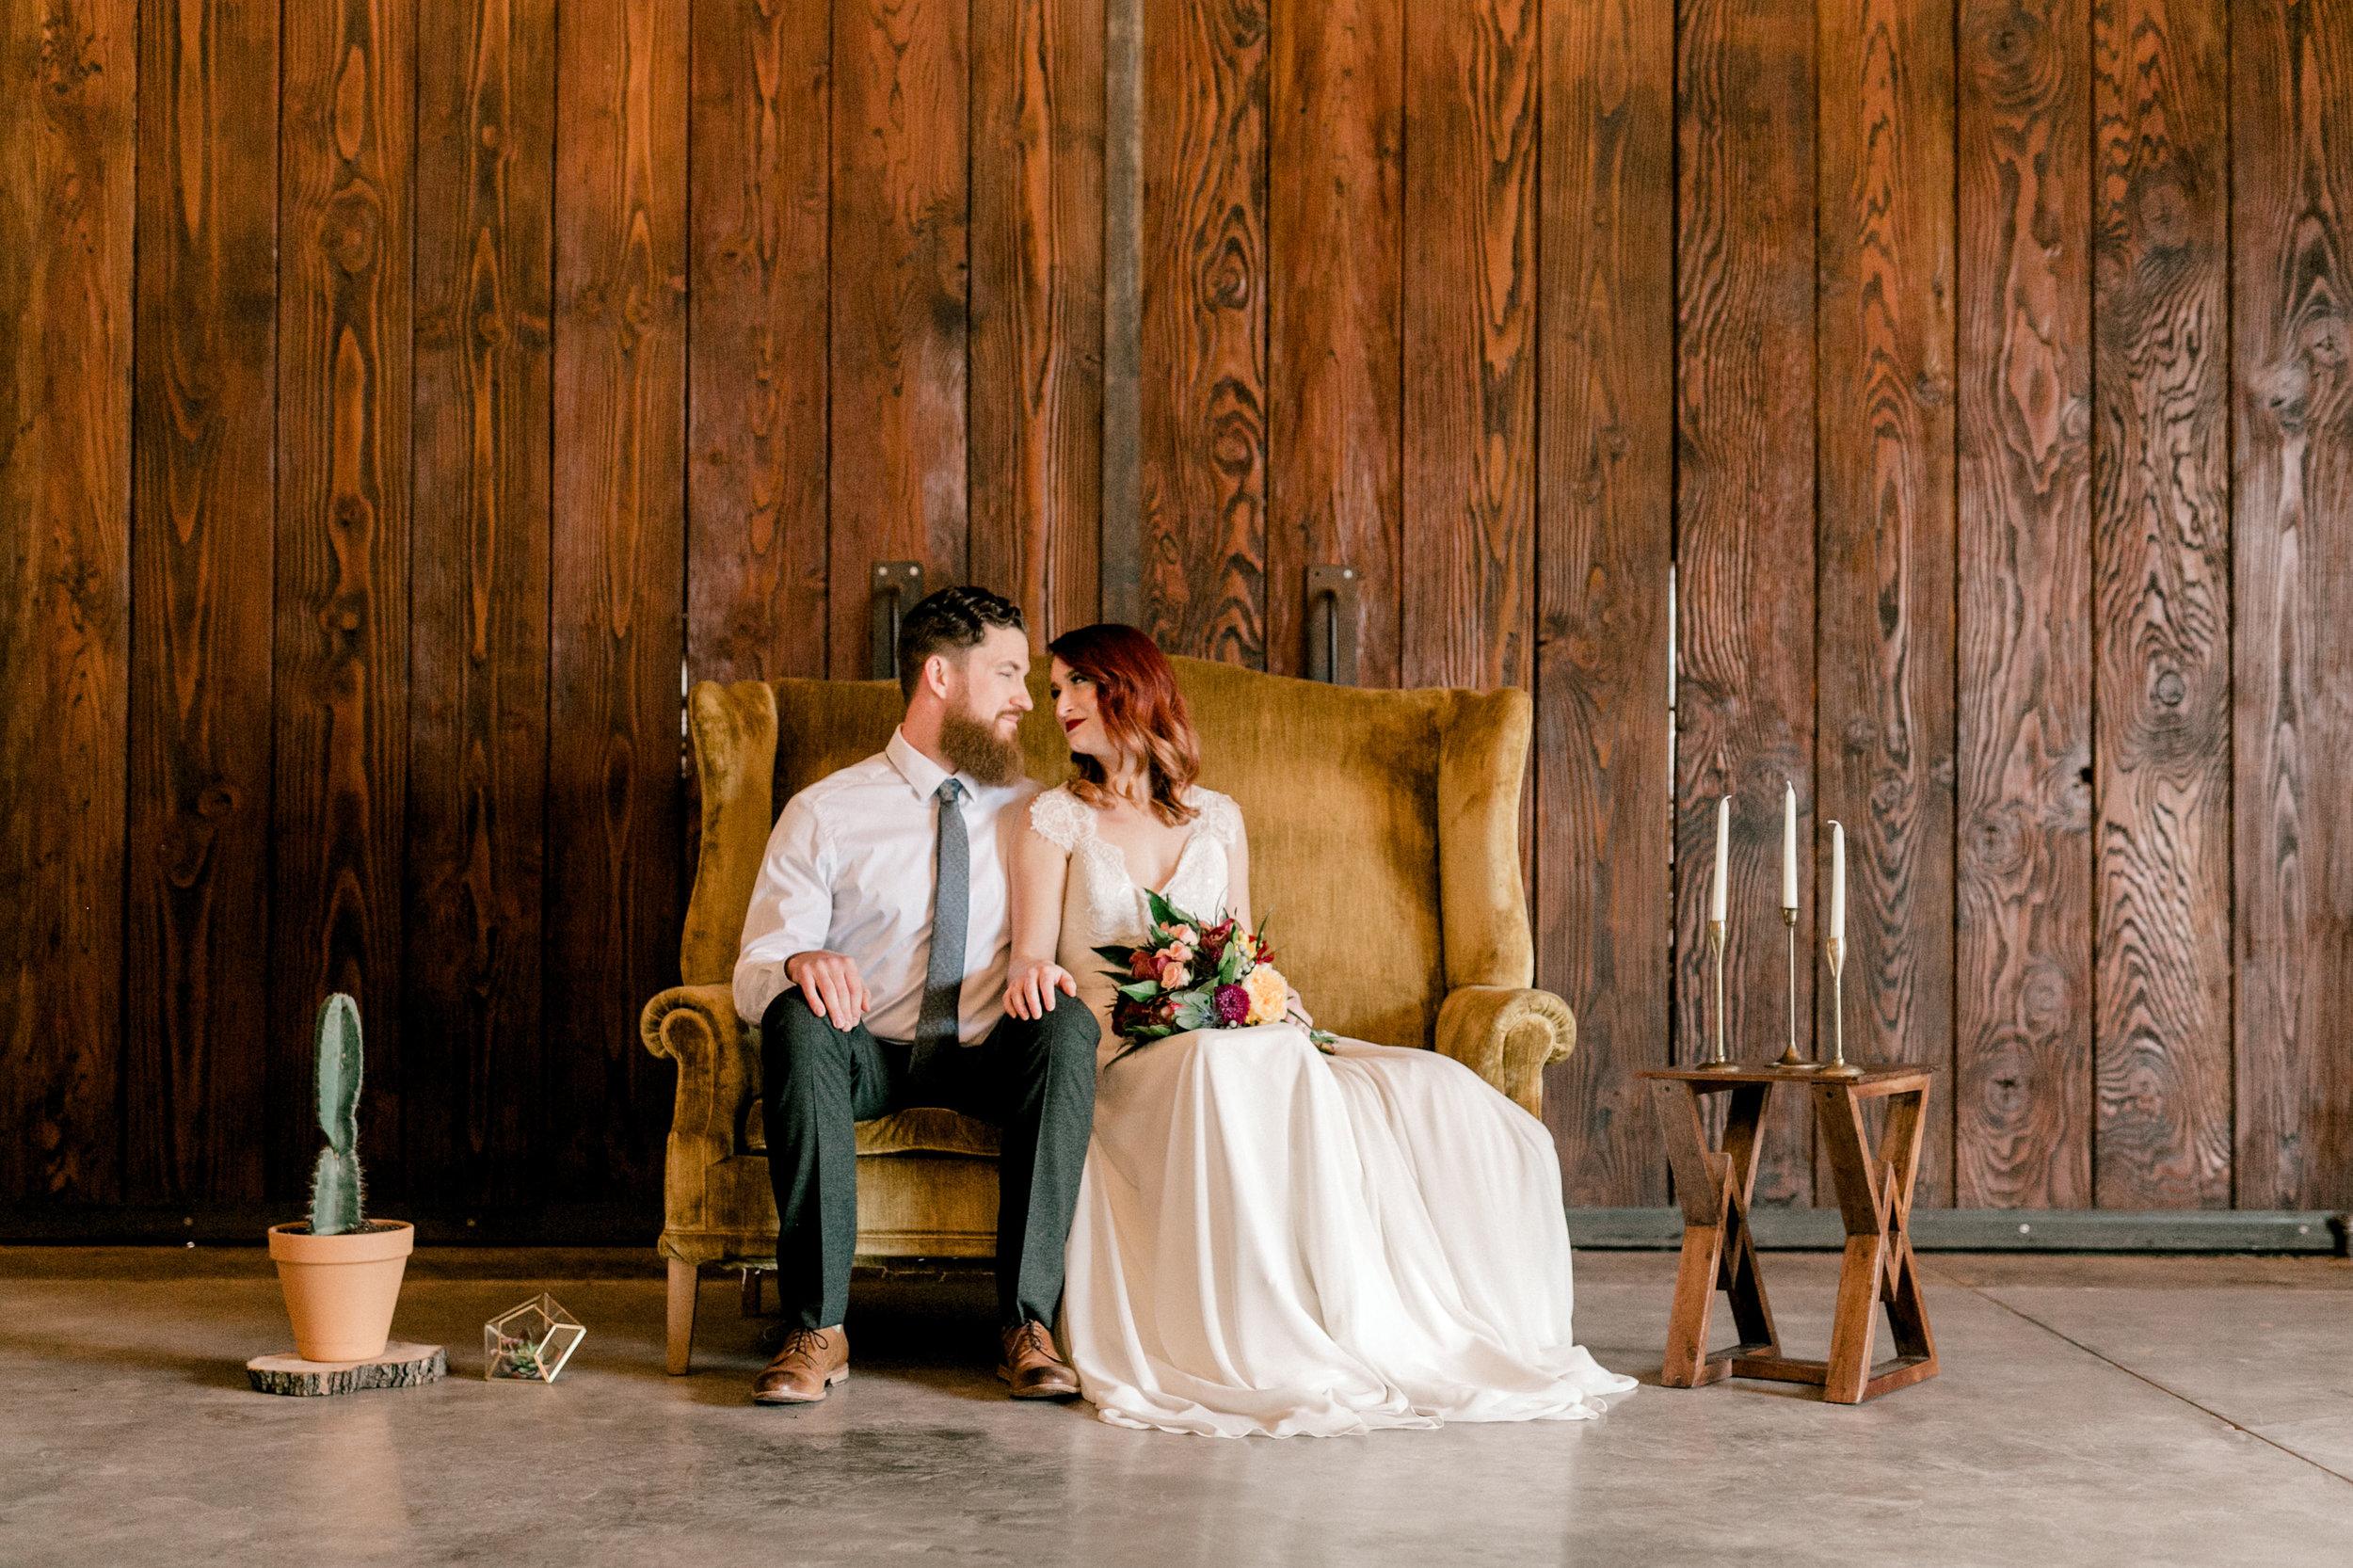 The-Baumberhof-_-Wedding-Pictures-_-Edmond-OK-_-by-oklahoma-wedding-photographer-Emily-Nicole-Photo-440.jpg